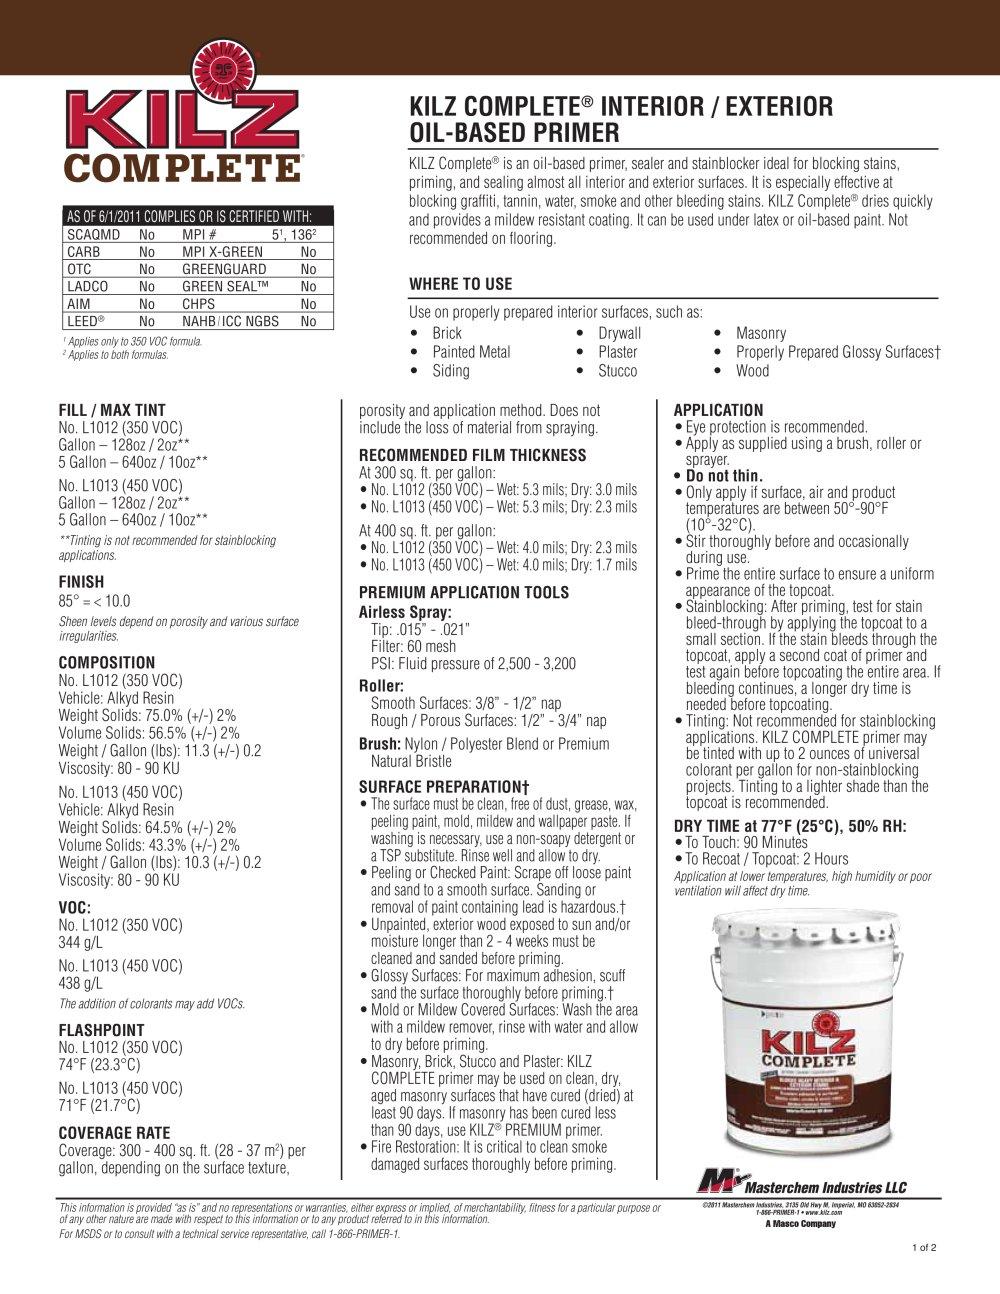 KILZ COMPLETE® INTERIOR / EXTERIOR OIL-BASED PRIMER - KILZ - PDF ...